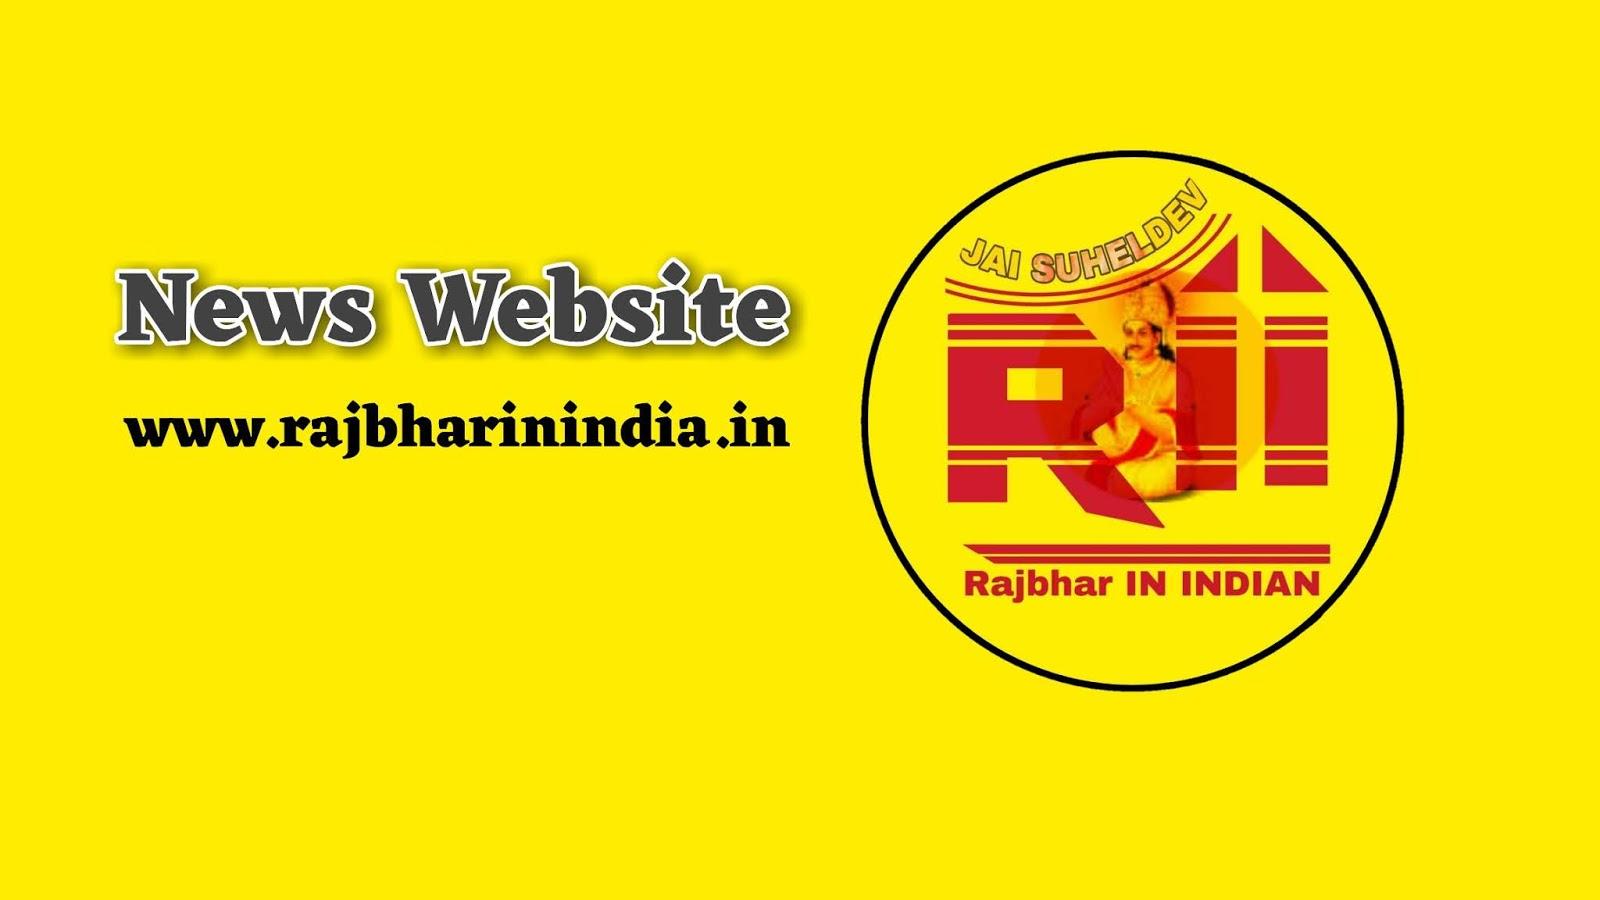 Rajbhar IN INDIA website